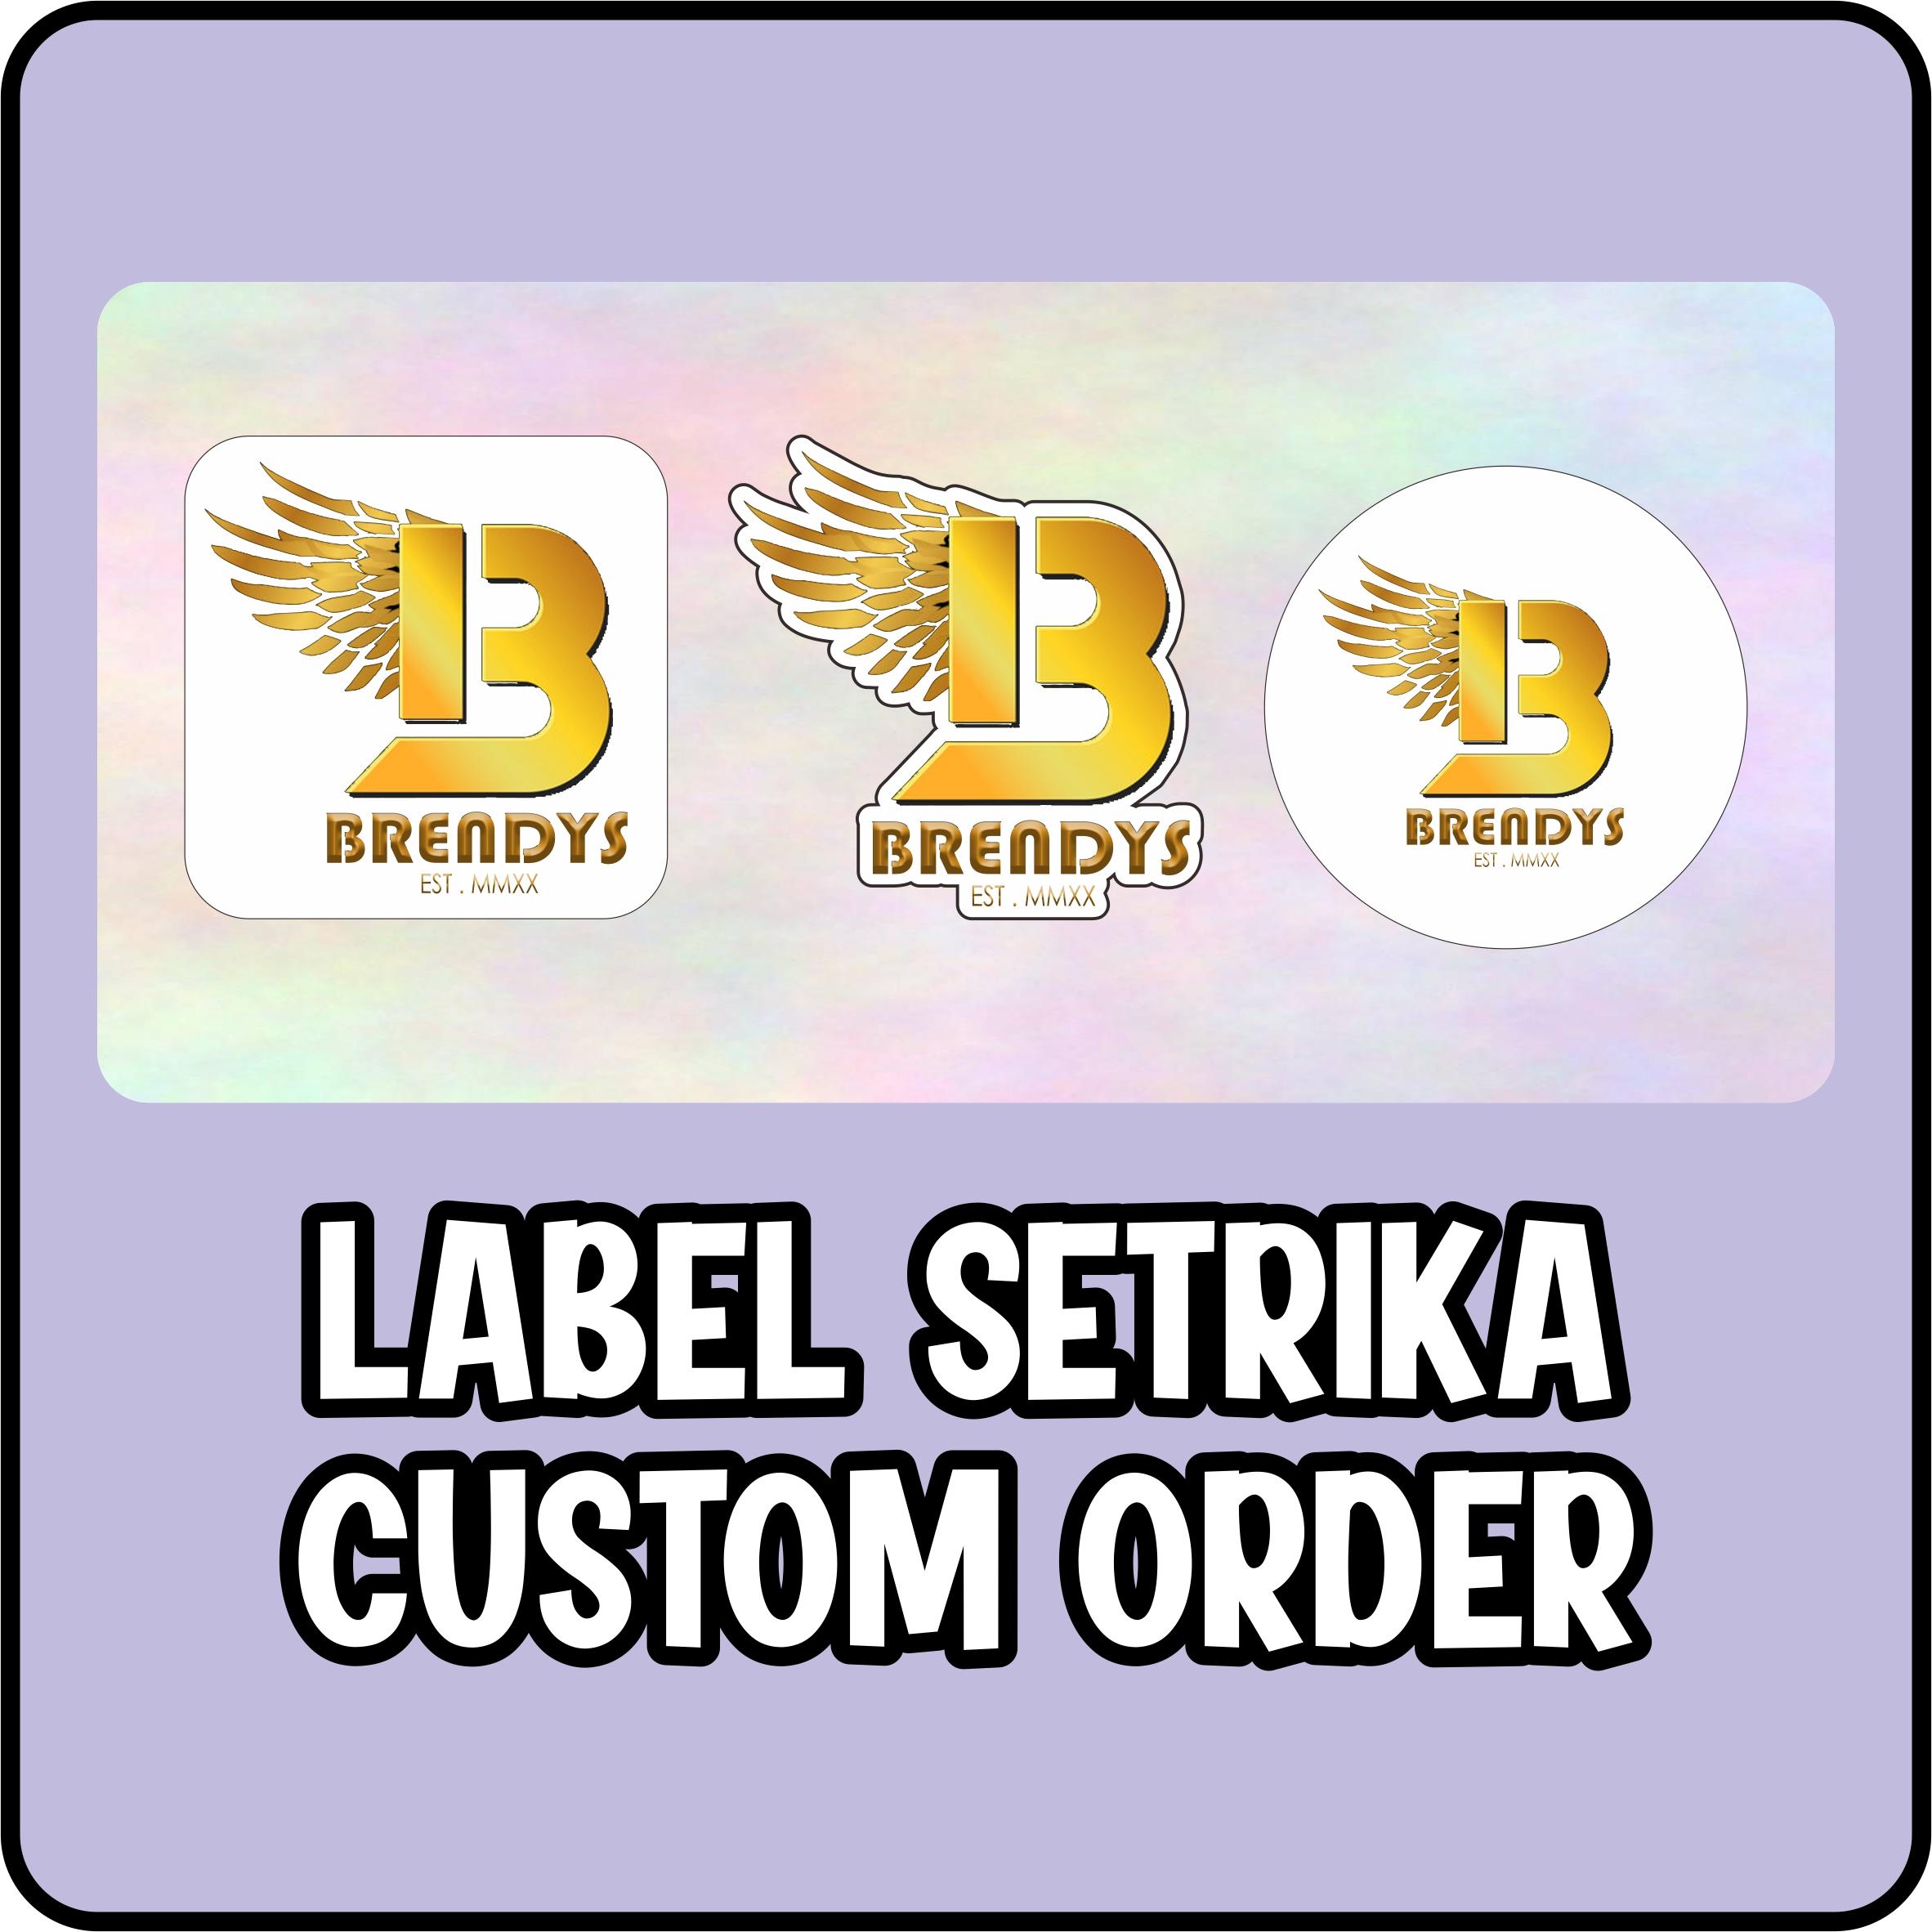 Label Setrika Custom Order